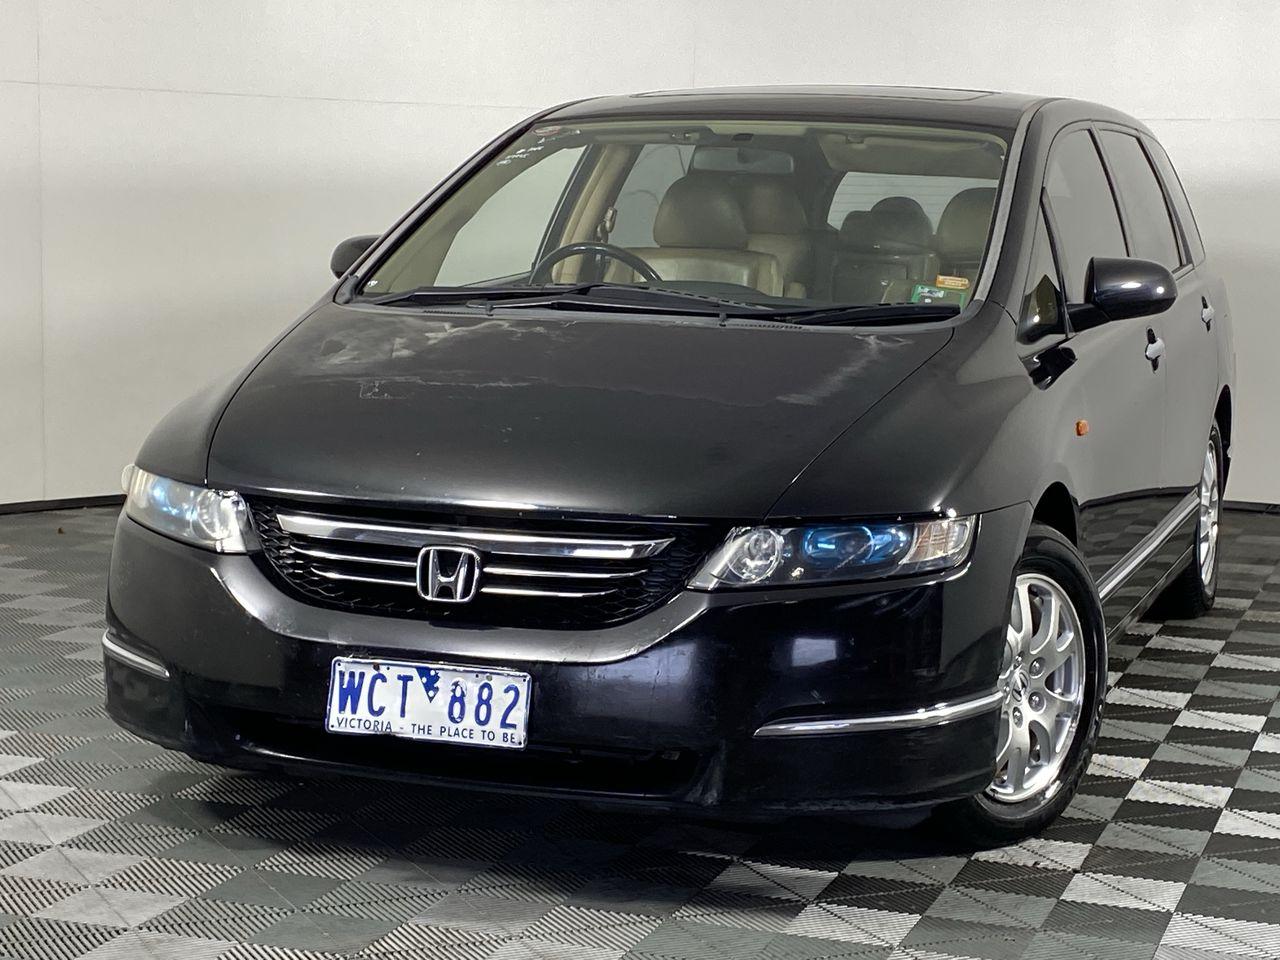 2005 Honda Odyssey Luxury Automatic 7 Seats People Mover